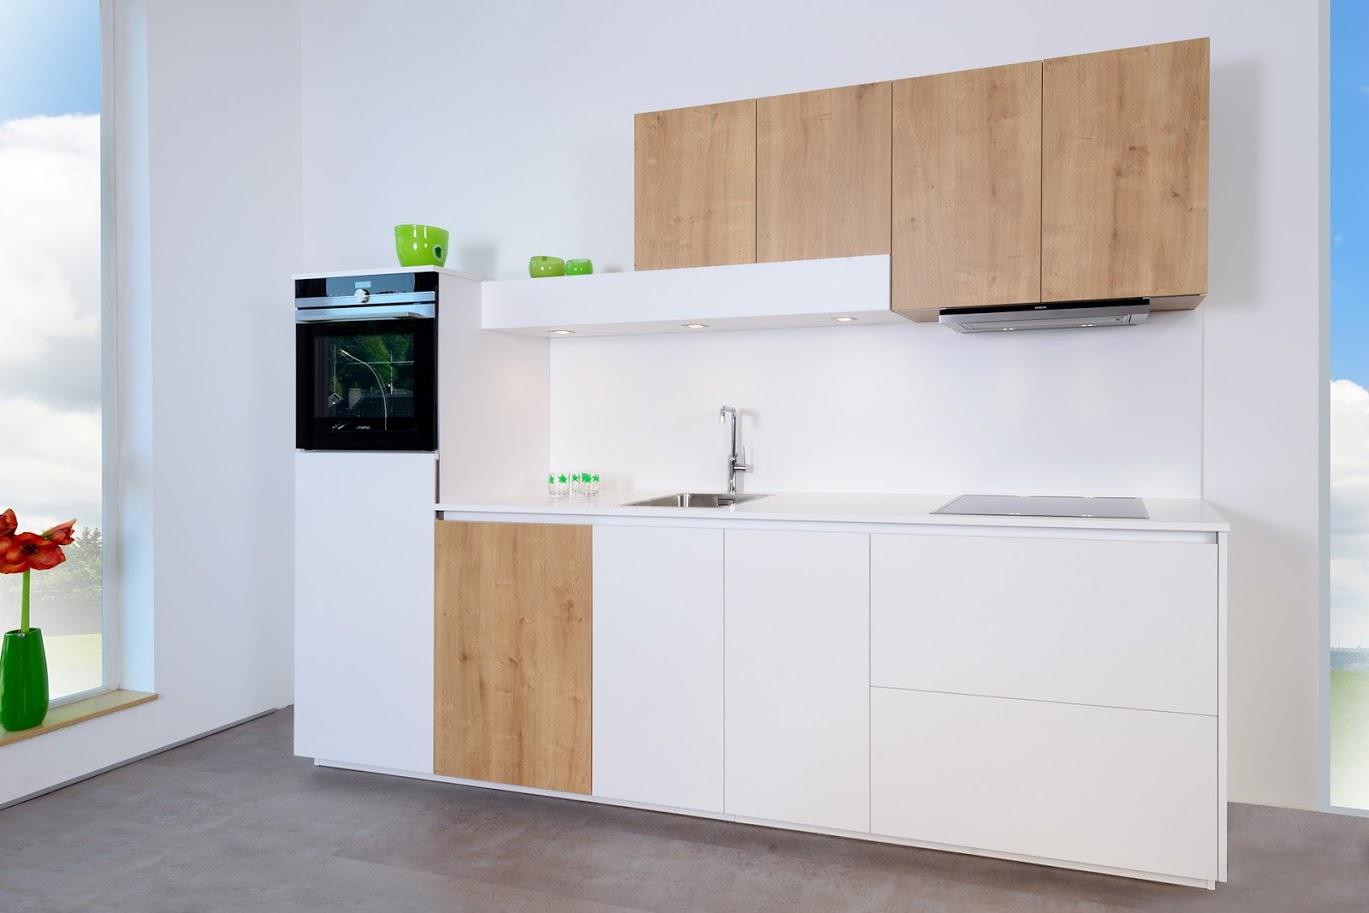 Full Size of Single Küche Ohne Elektrogeräte Obi Single Küche Single Küche Ikea Single Küche Landhausstil Küche Single Küche